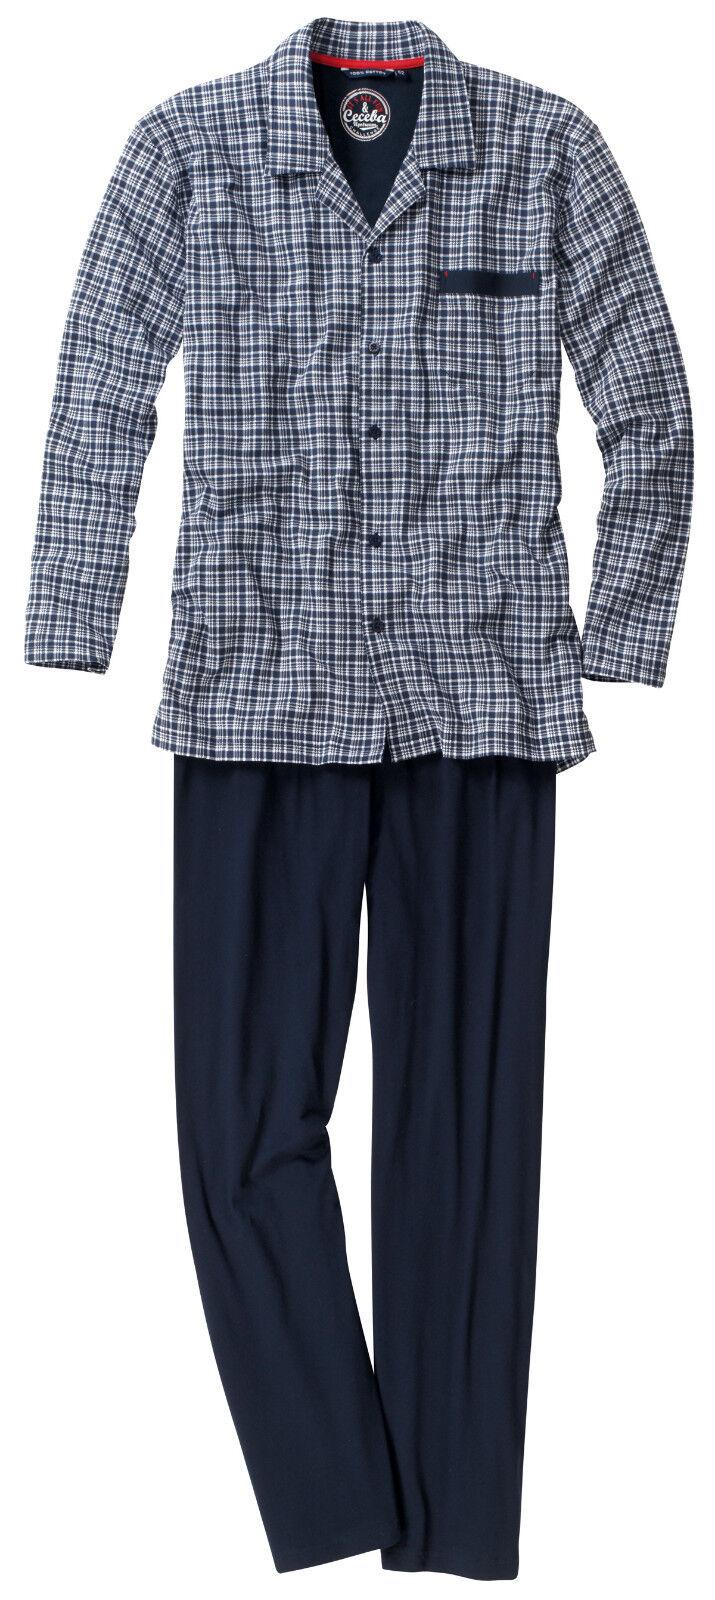 Pyjama -- Schlafanzug lang....durchgeknöpft...Ceceba....Größe 58.. Single Jersey